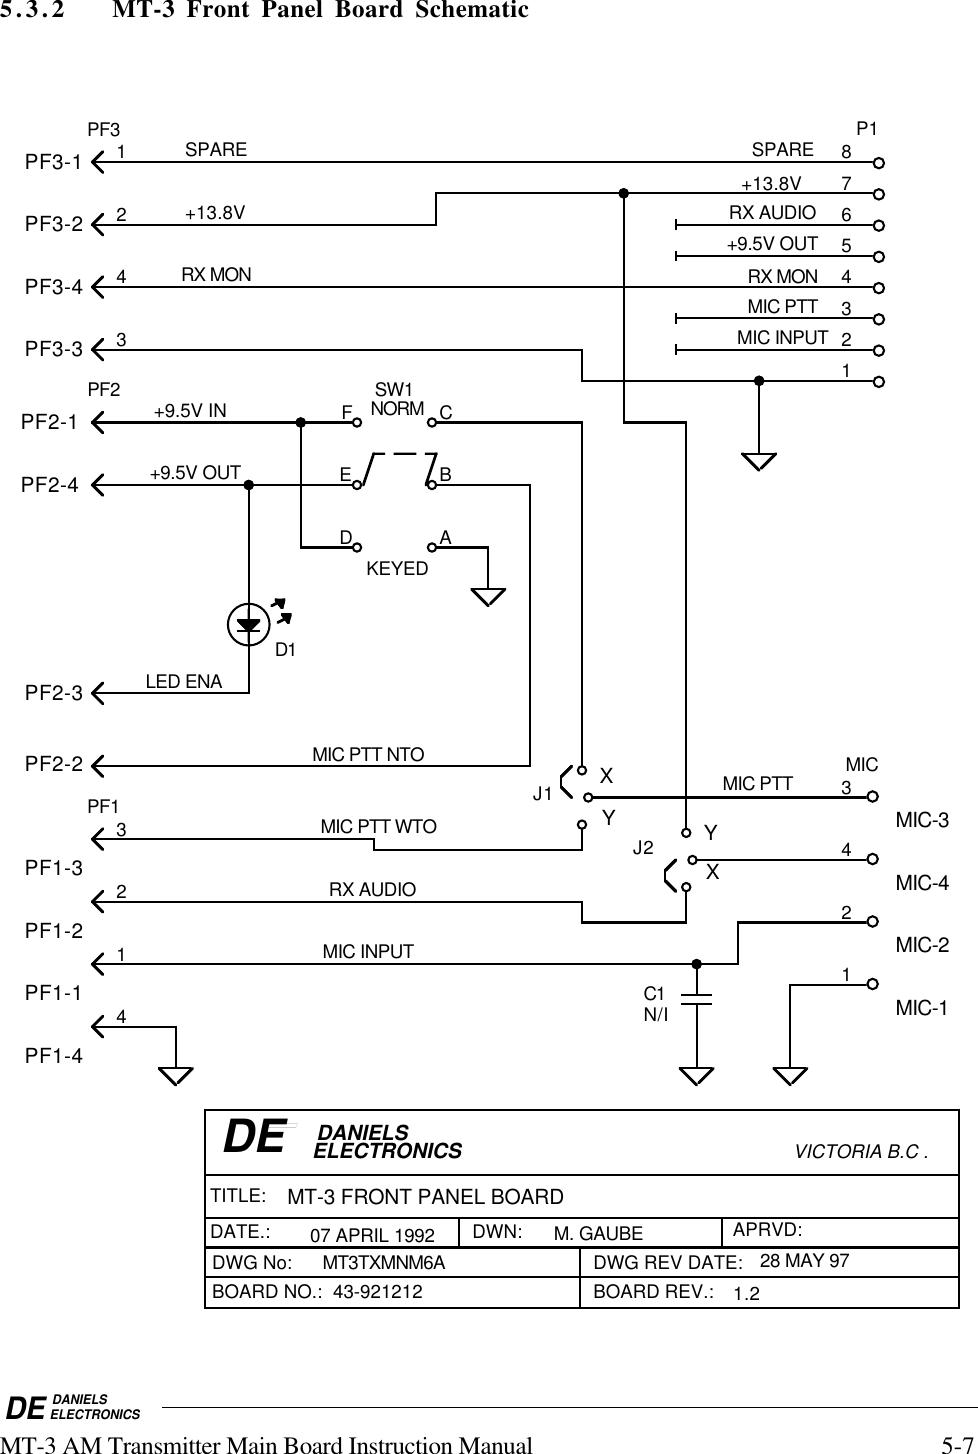 Codan Radio Communications Vt 3a130 S Fsh Transmitter User Manual Mt Panel Board Schematic De Danielselectronicsmt 3 Am Main Instruction 5 7532